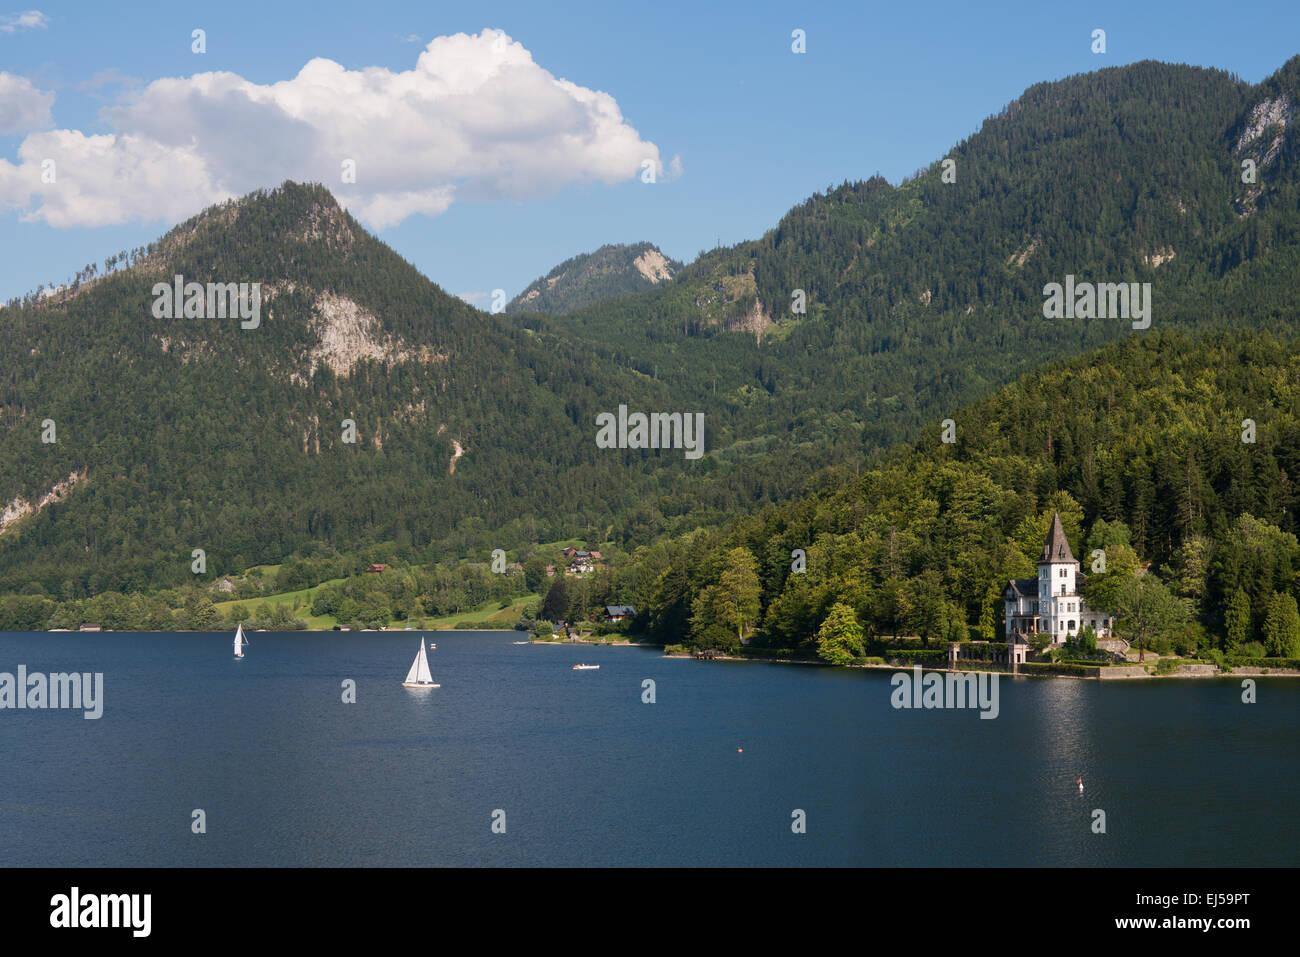 Villa Castiglioni am Grundlsee, Salzkammergut, Styria, Austria - Stock Image